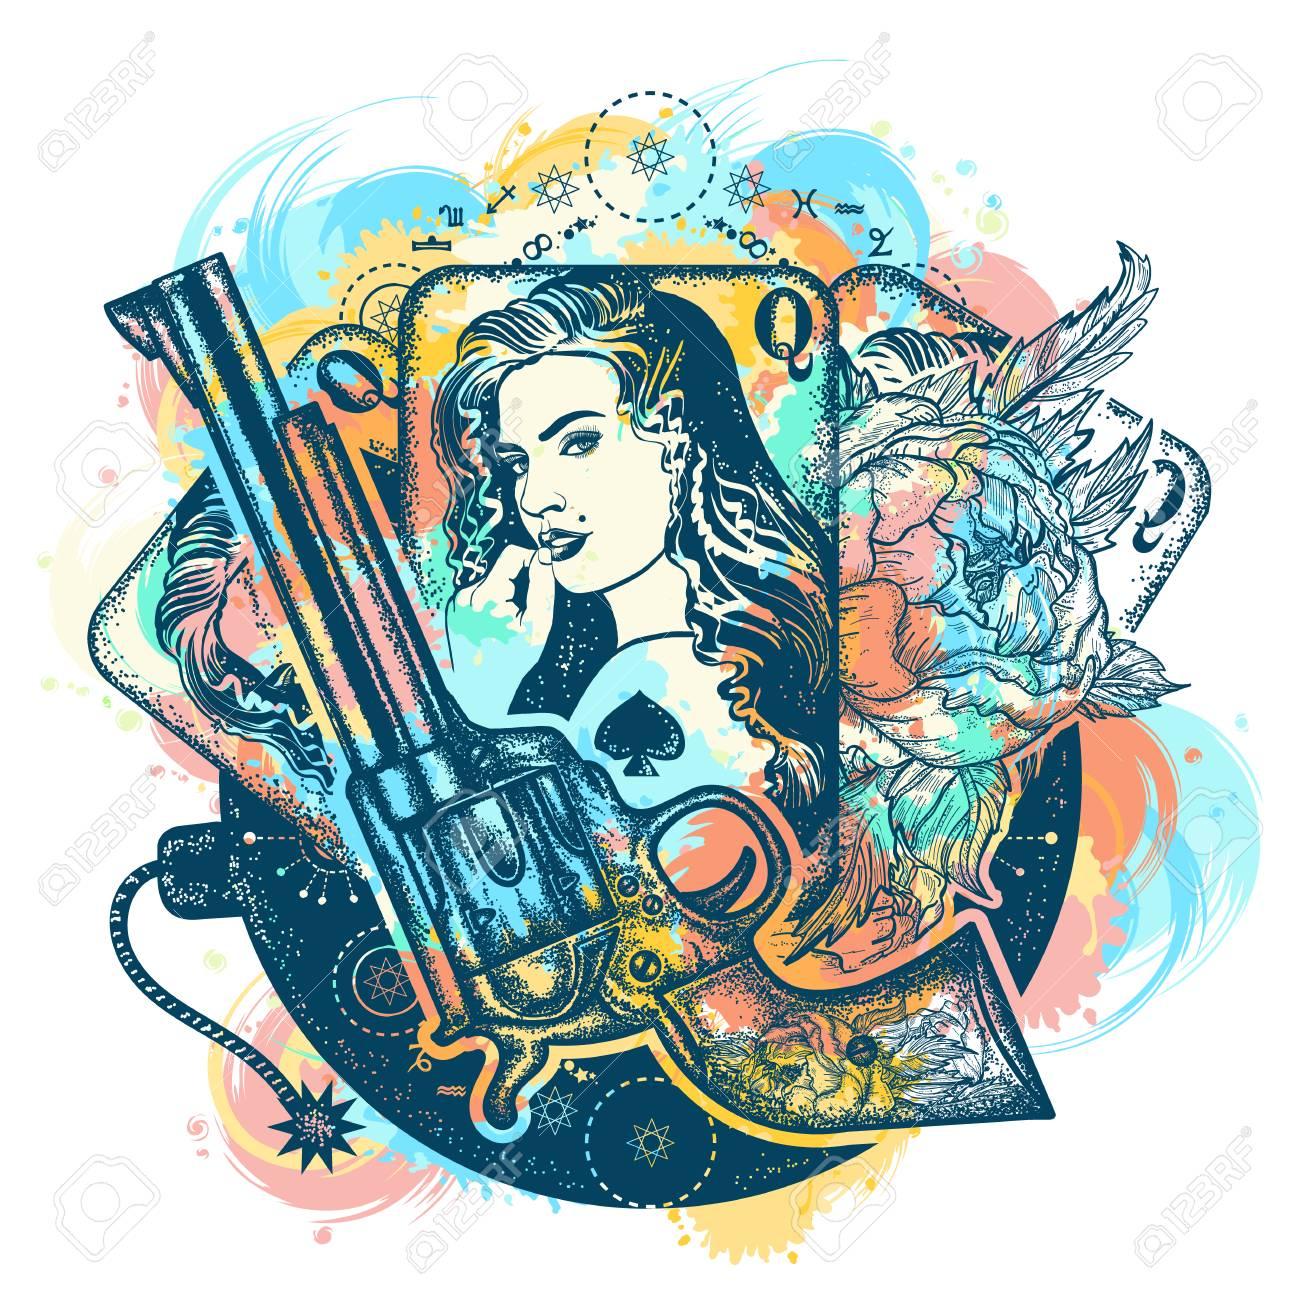 Revolver, playing cards, beautiful girl, bomb tattoo art. Casino, criminal background, gangster mafia. Vintage playing cards, roses, gun t-shirt design. Wild west tattoo and t-shirt design - 89056730